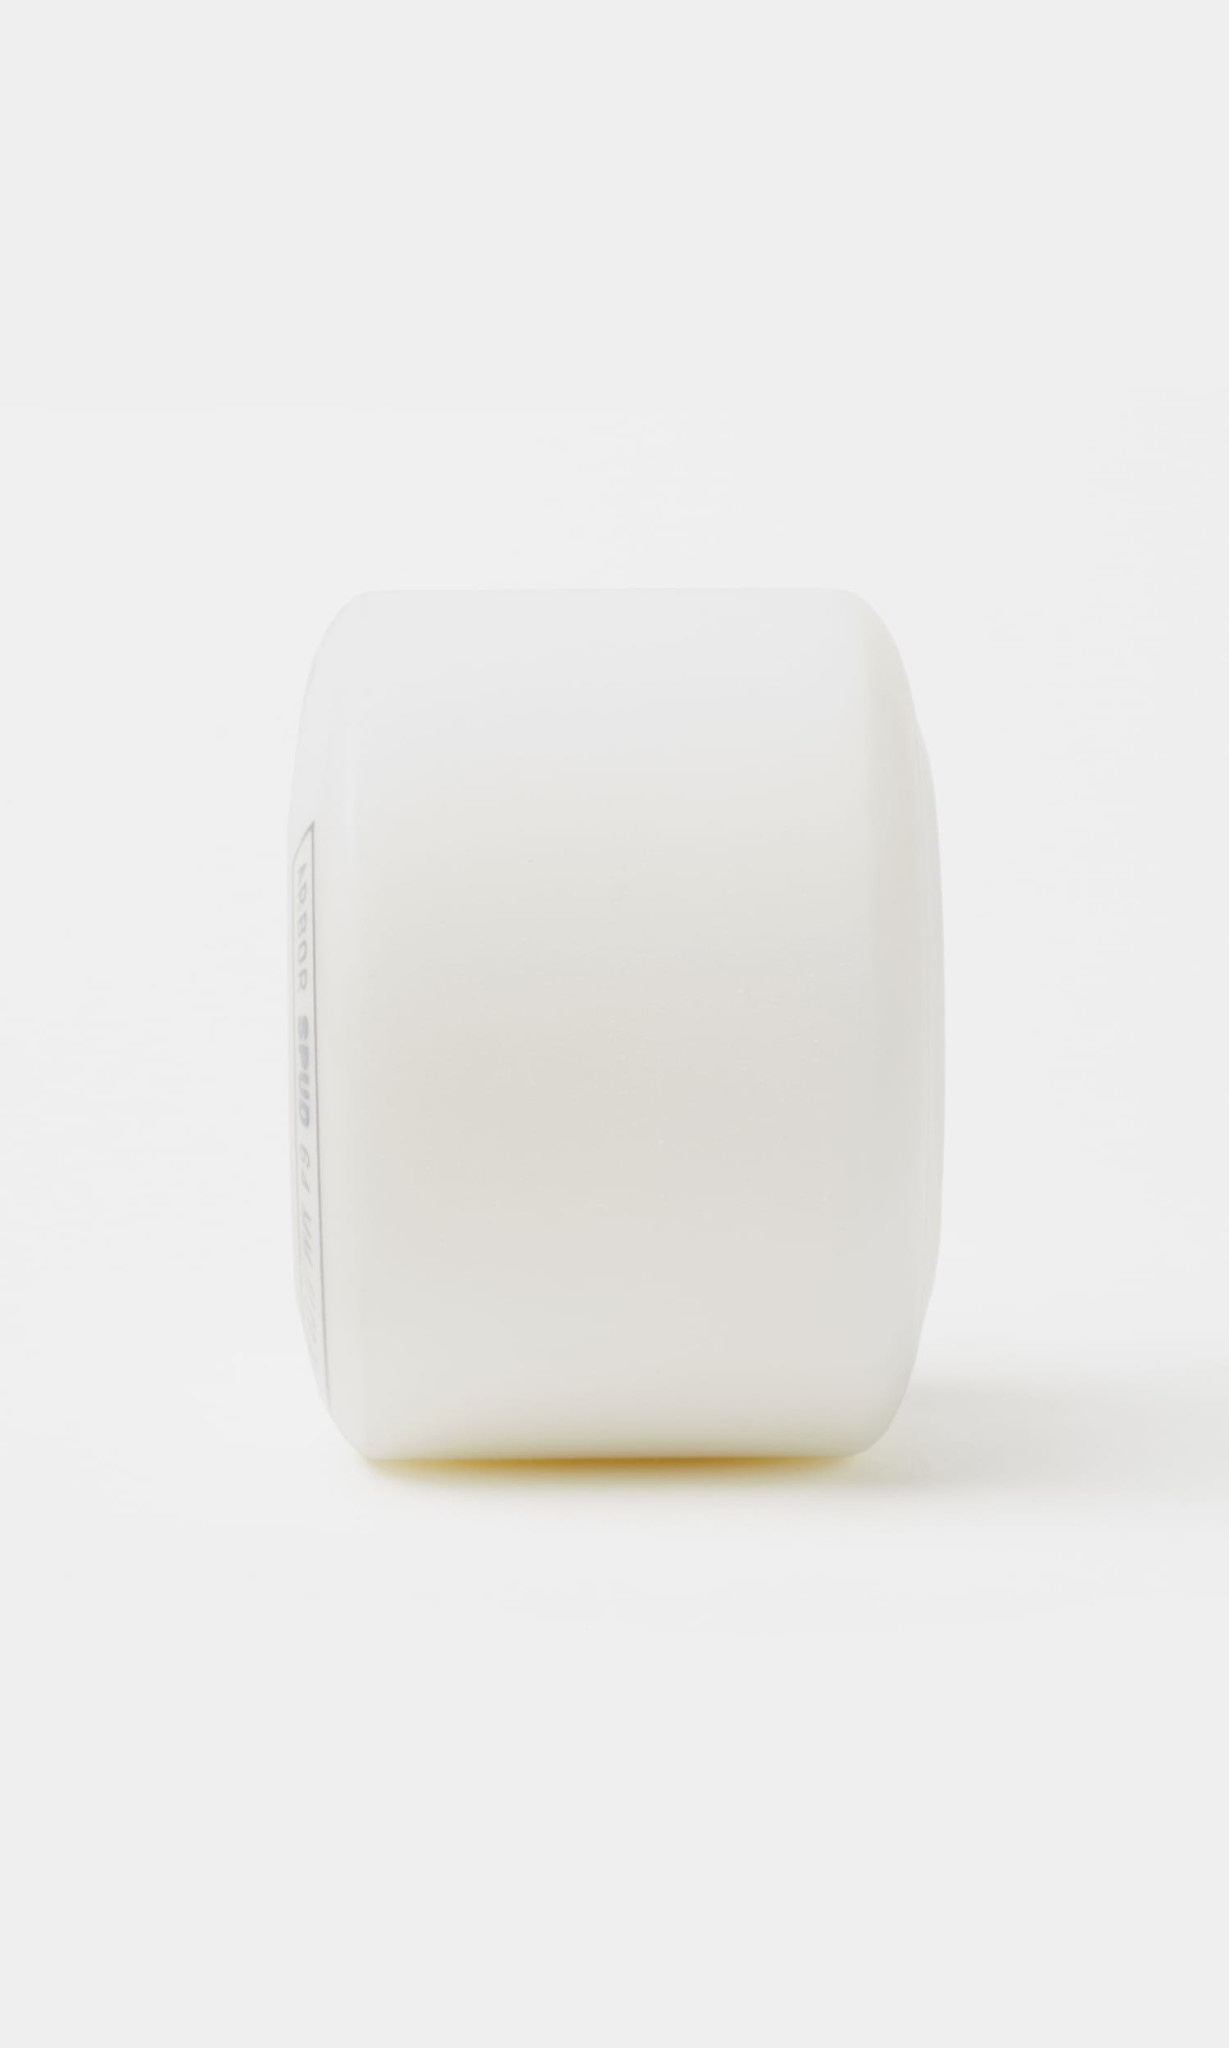 Arbor Spud - Sucrose Initiative 82a White 64mm